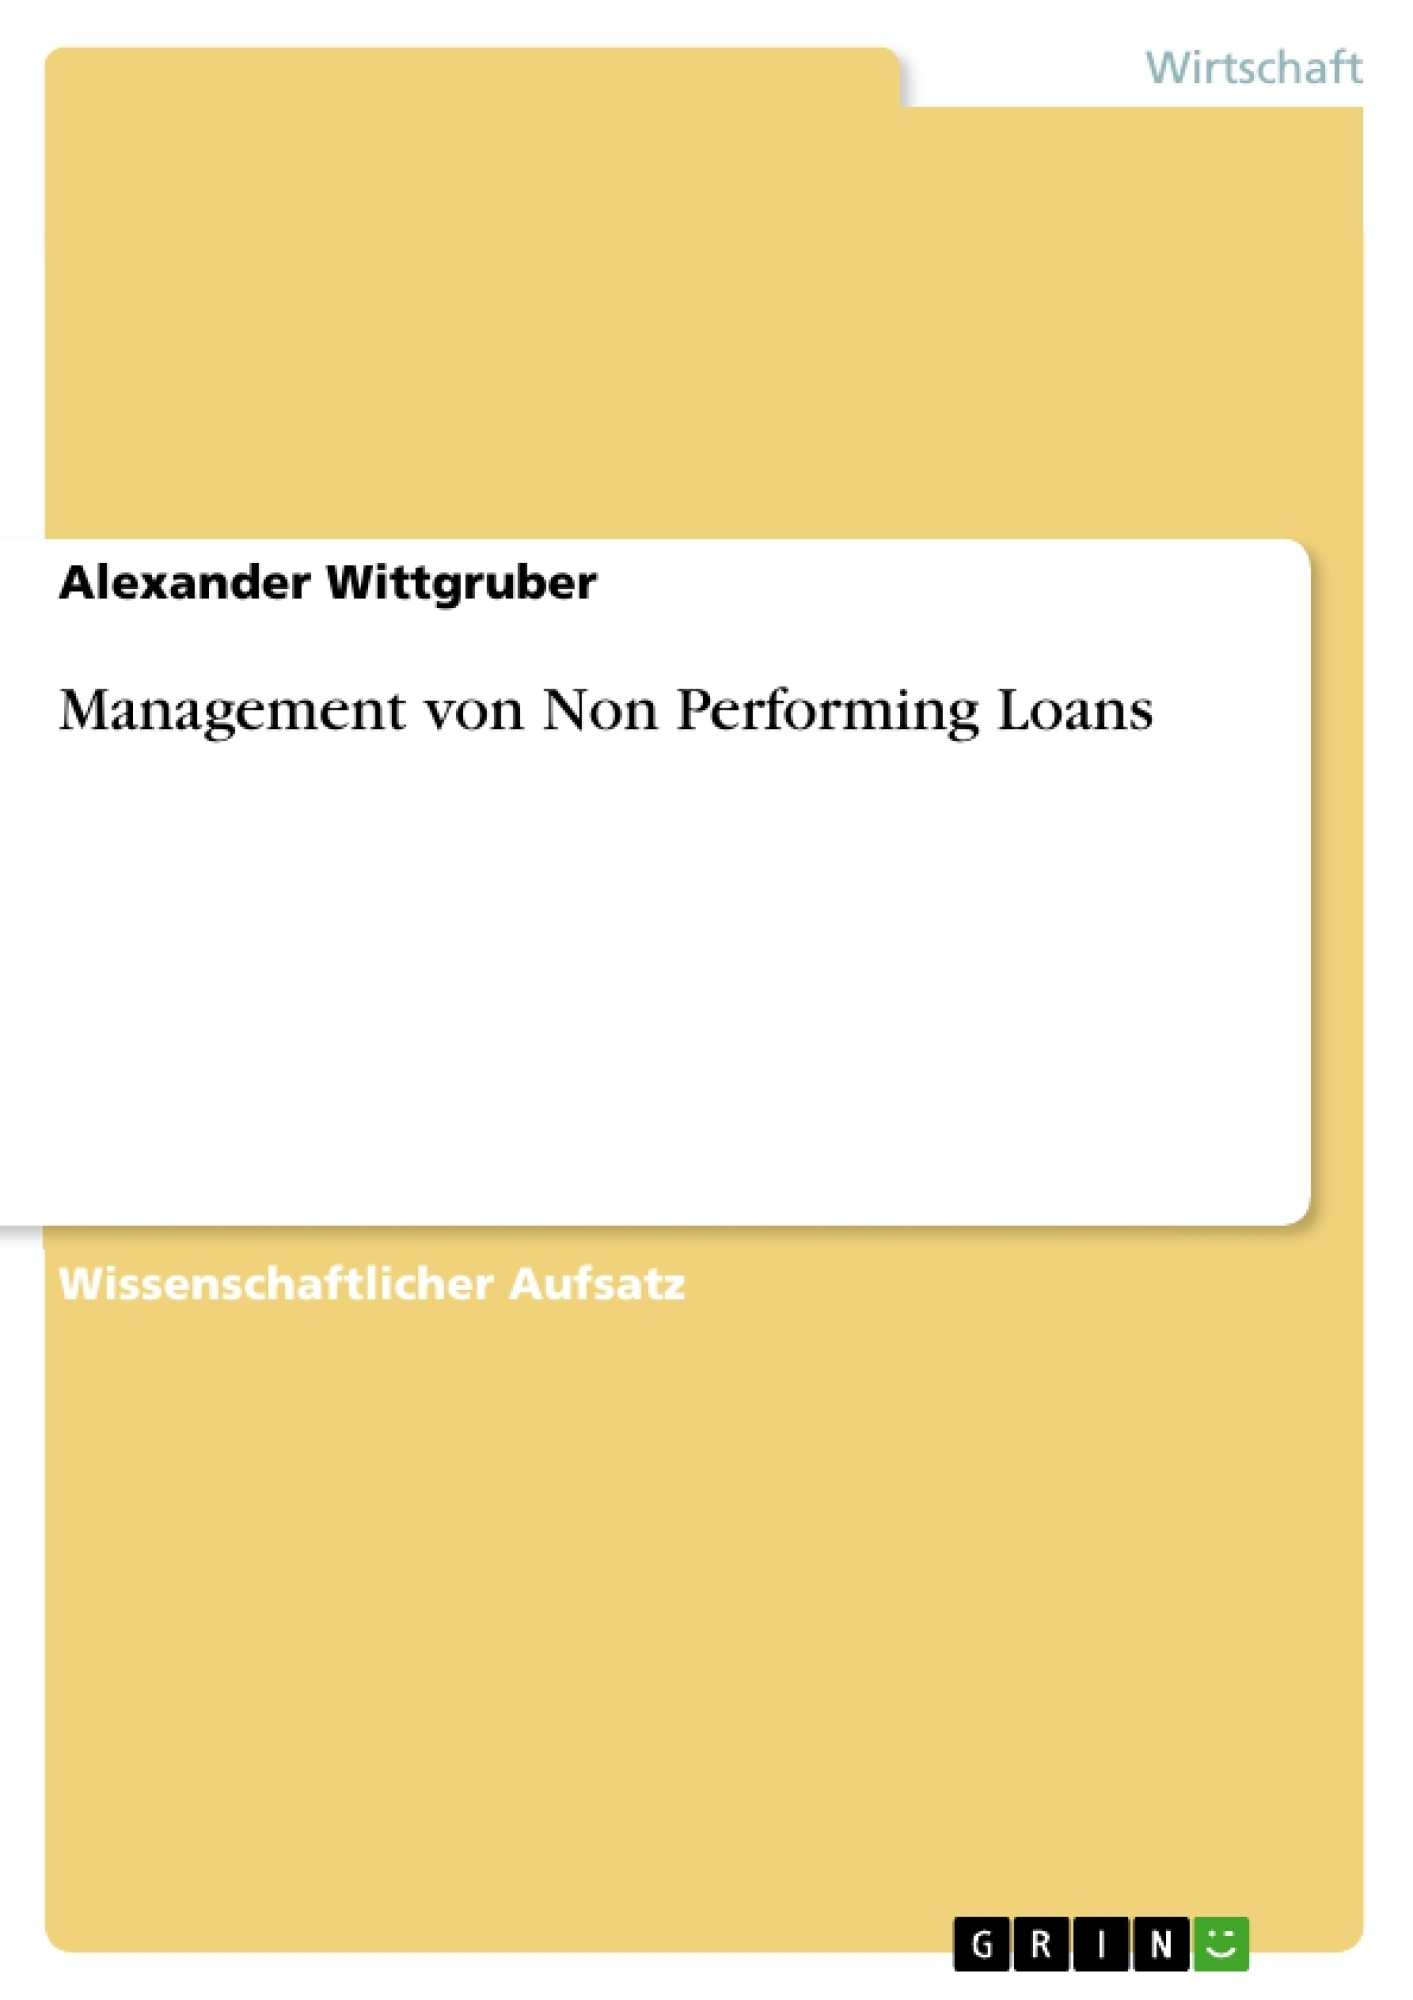 Titel: Management von Non Performing Loans